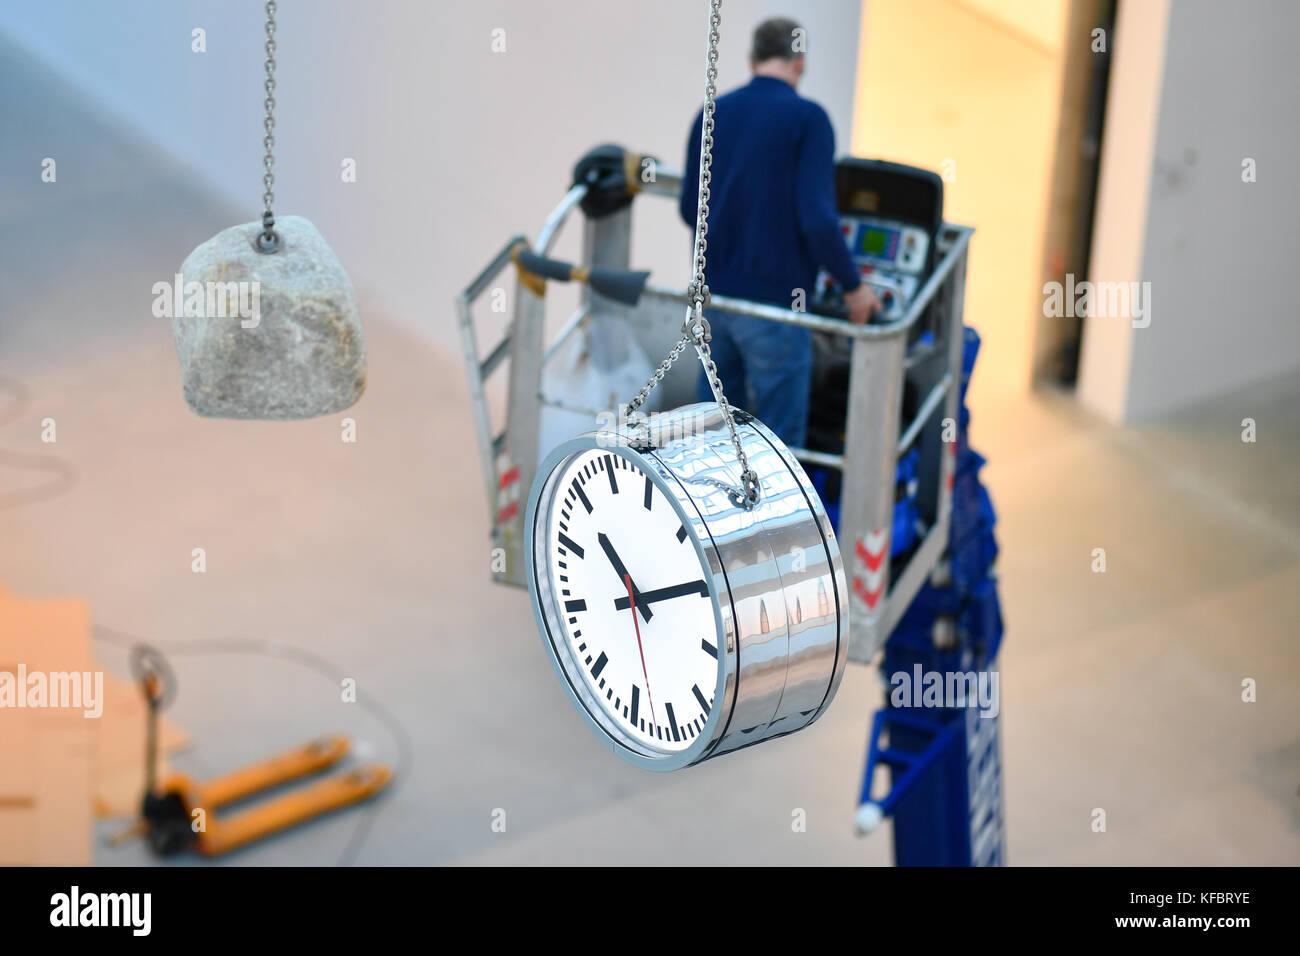 Mannheim, Germania. 27 ott 2017. L'illustrazione 'Die bewegte leere des momenti' da alicja kwade può Immagini Stock